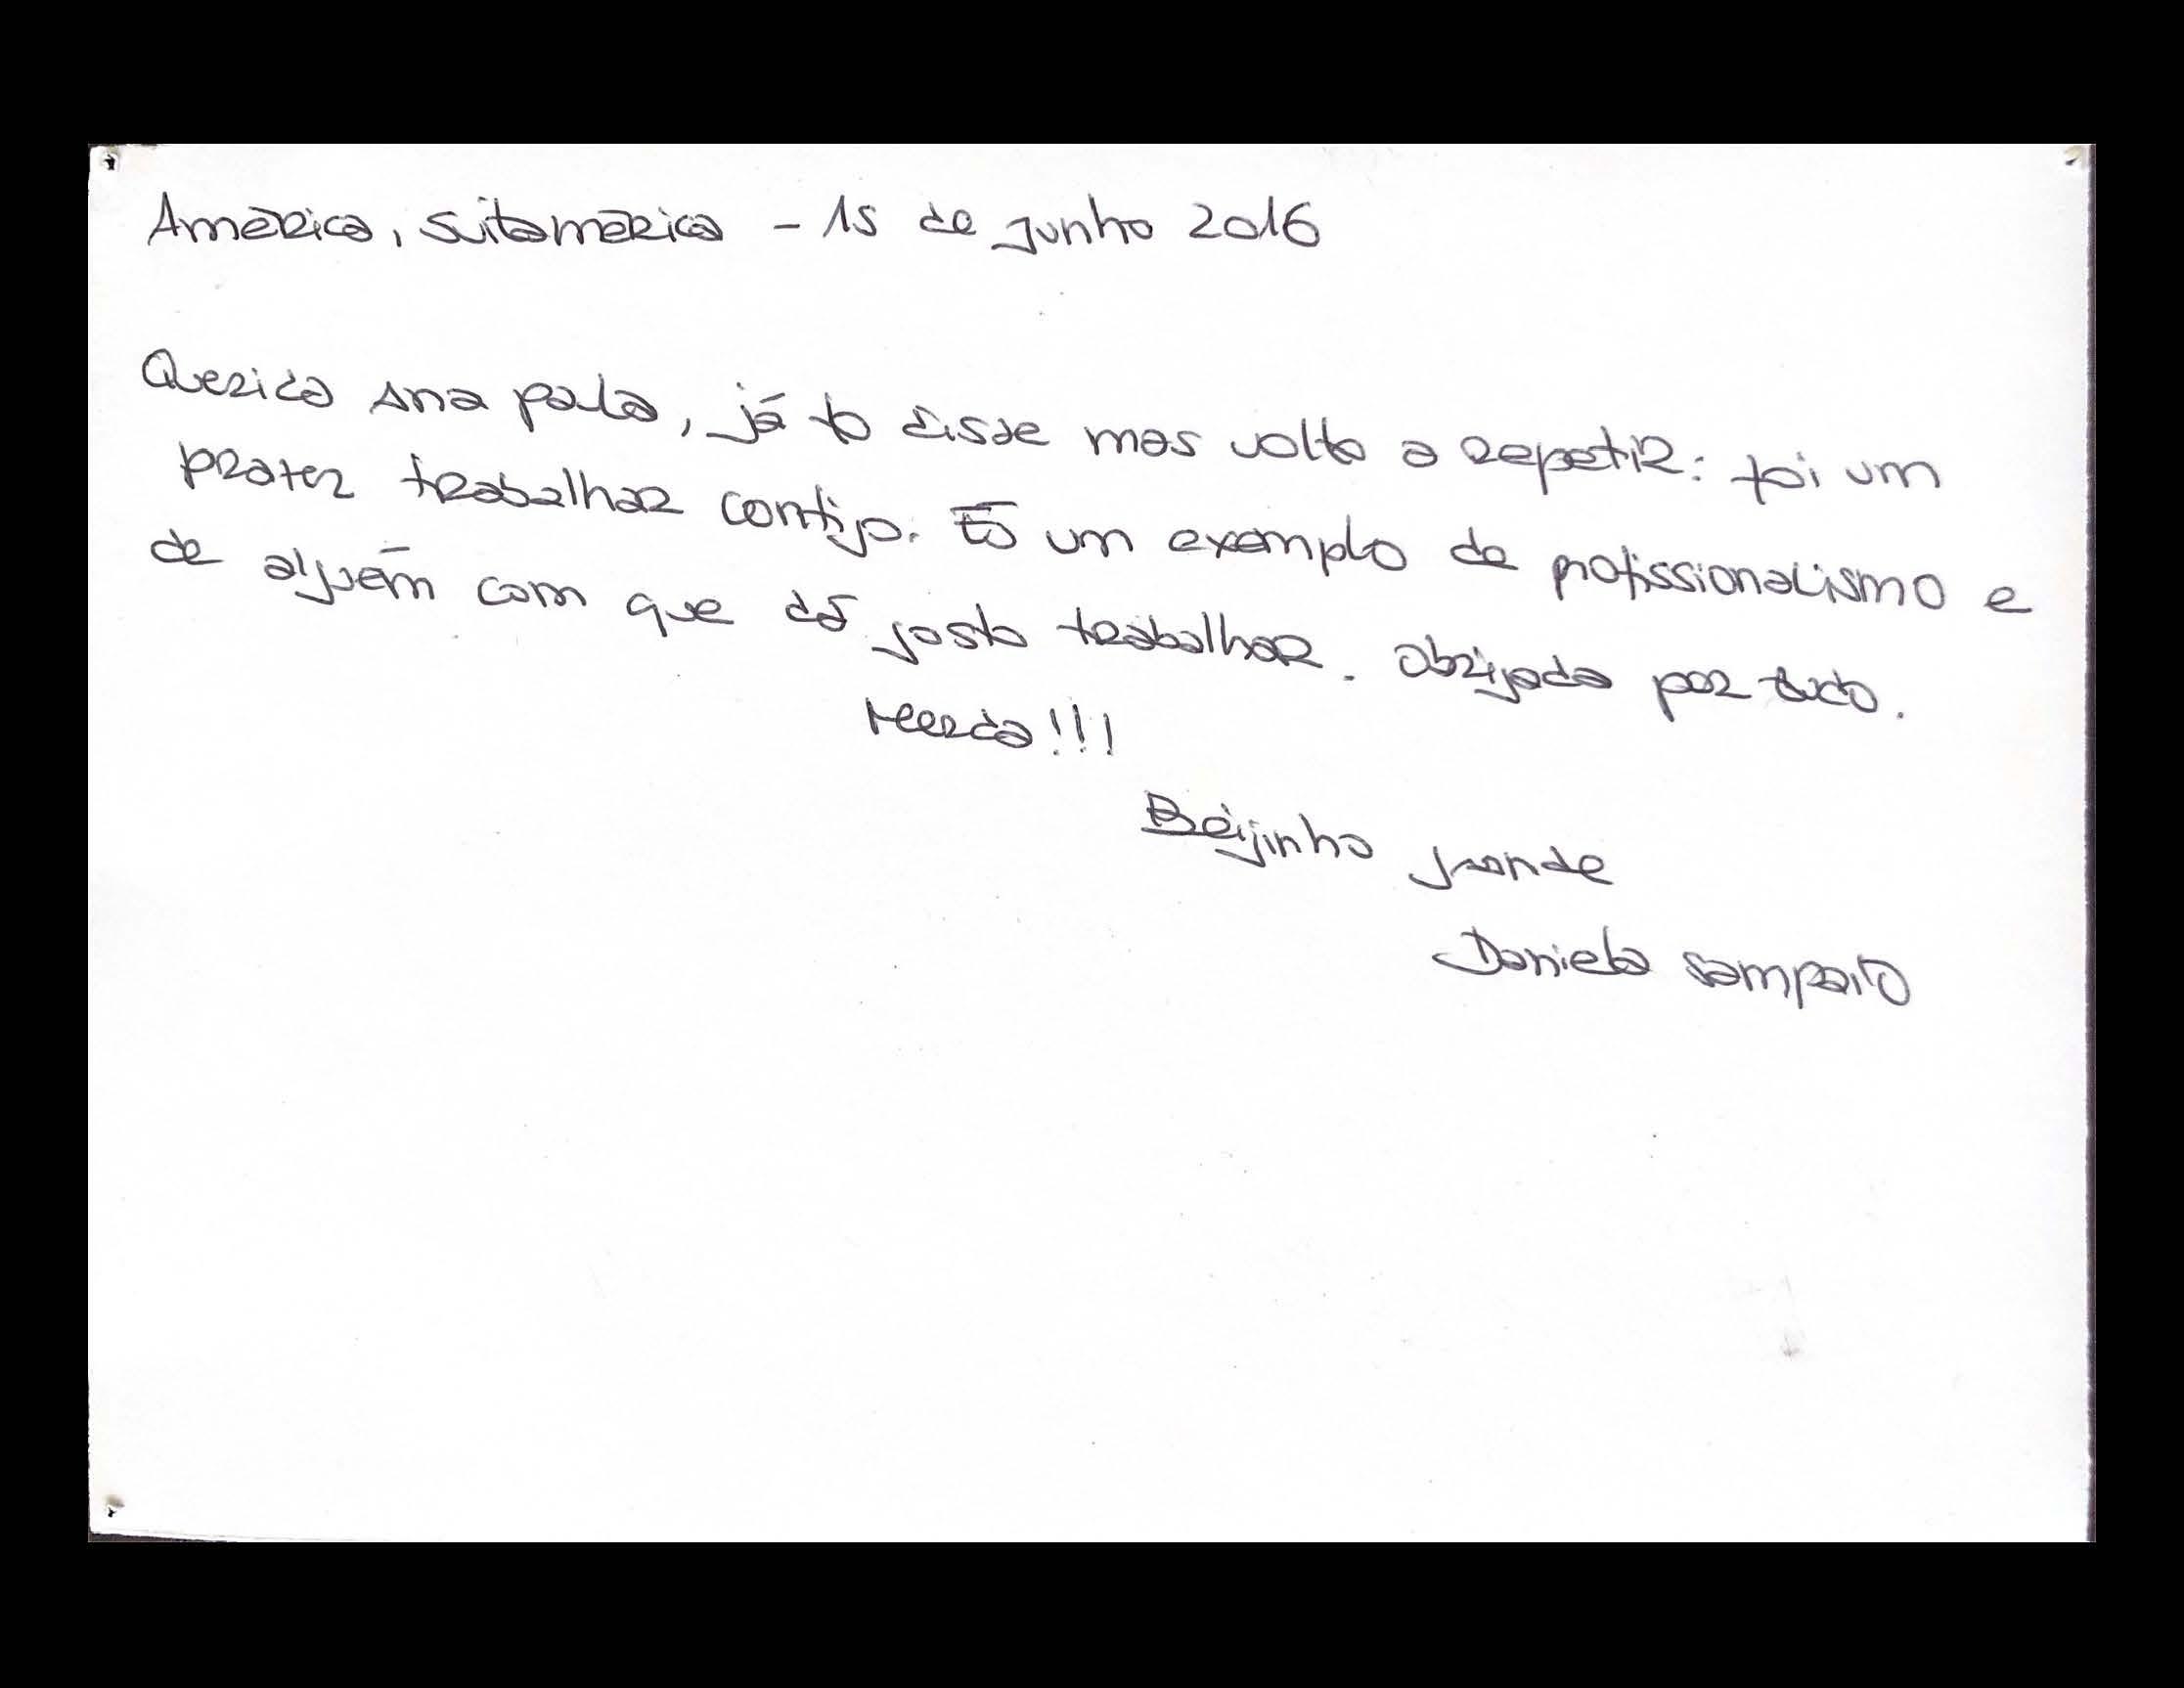 Ana Paula Rocha - Testemunhos - 014